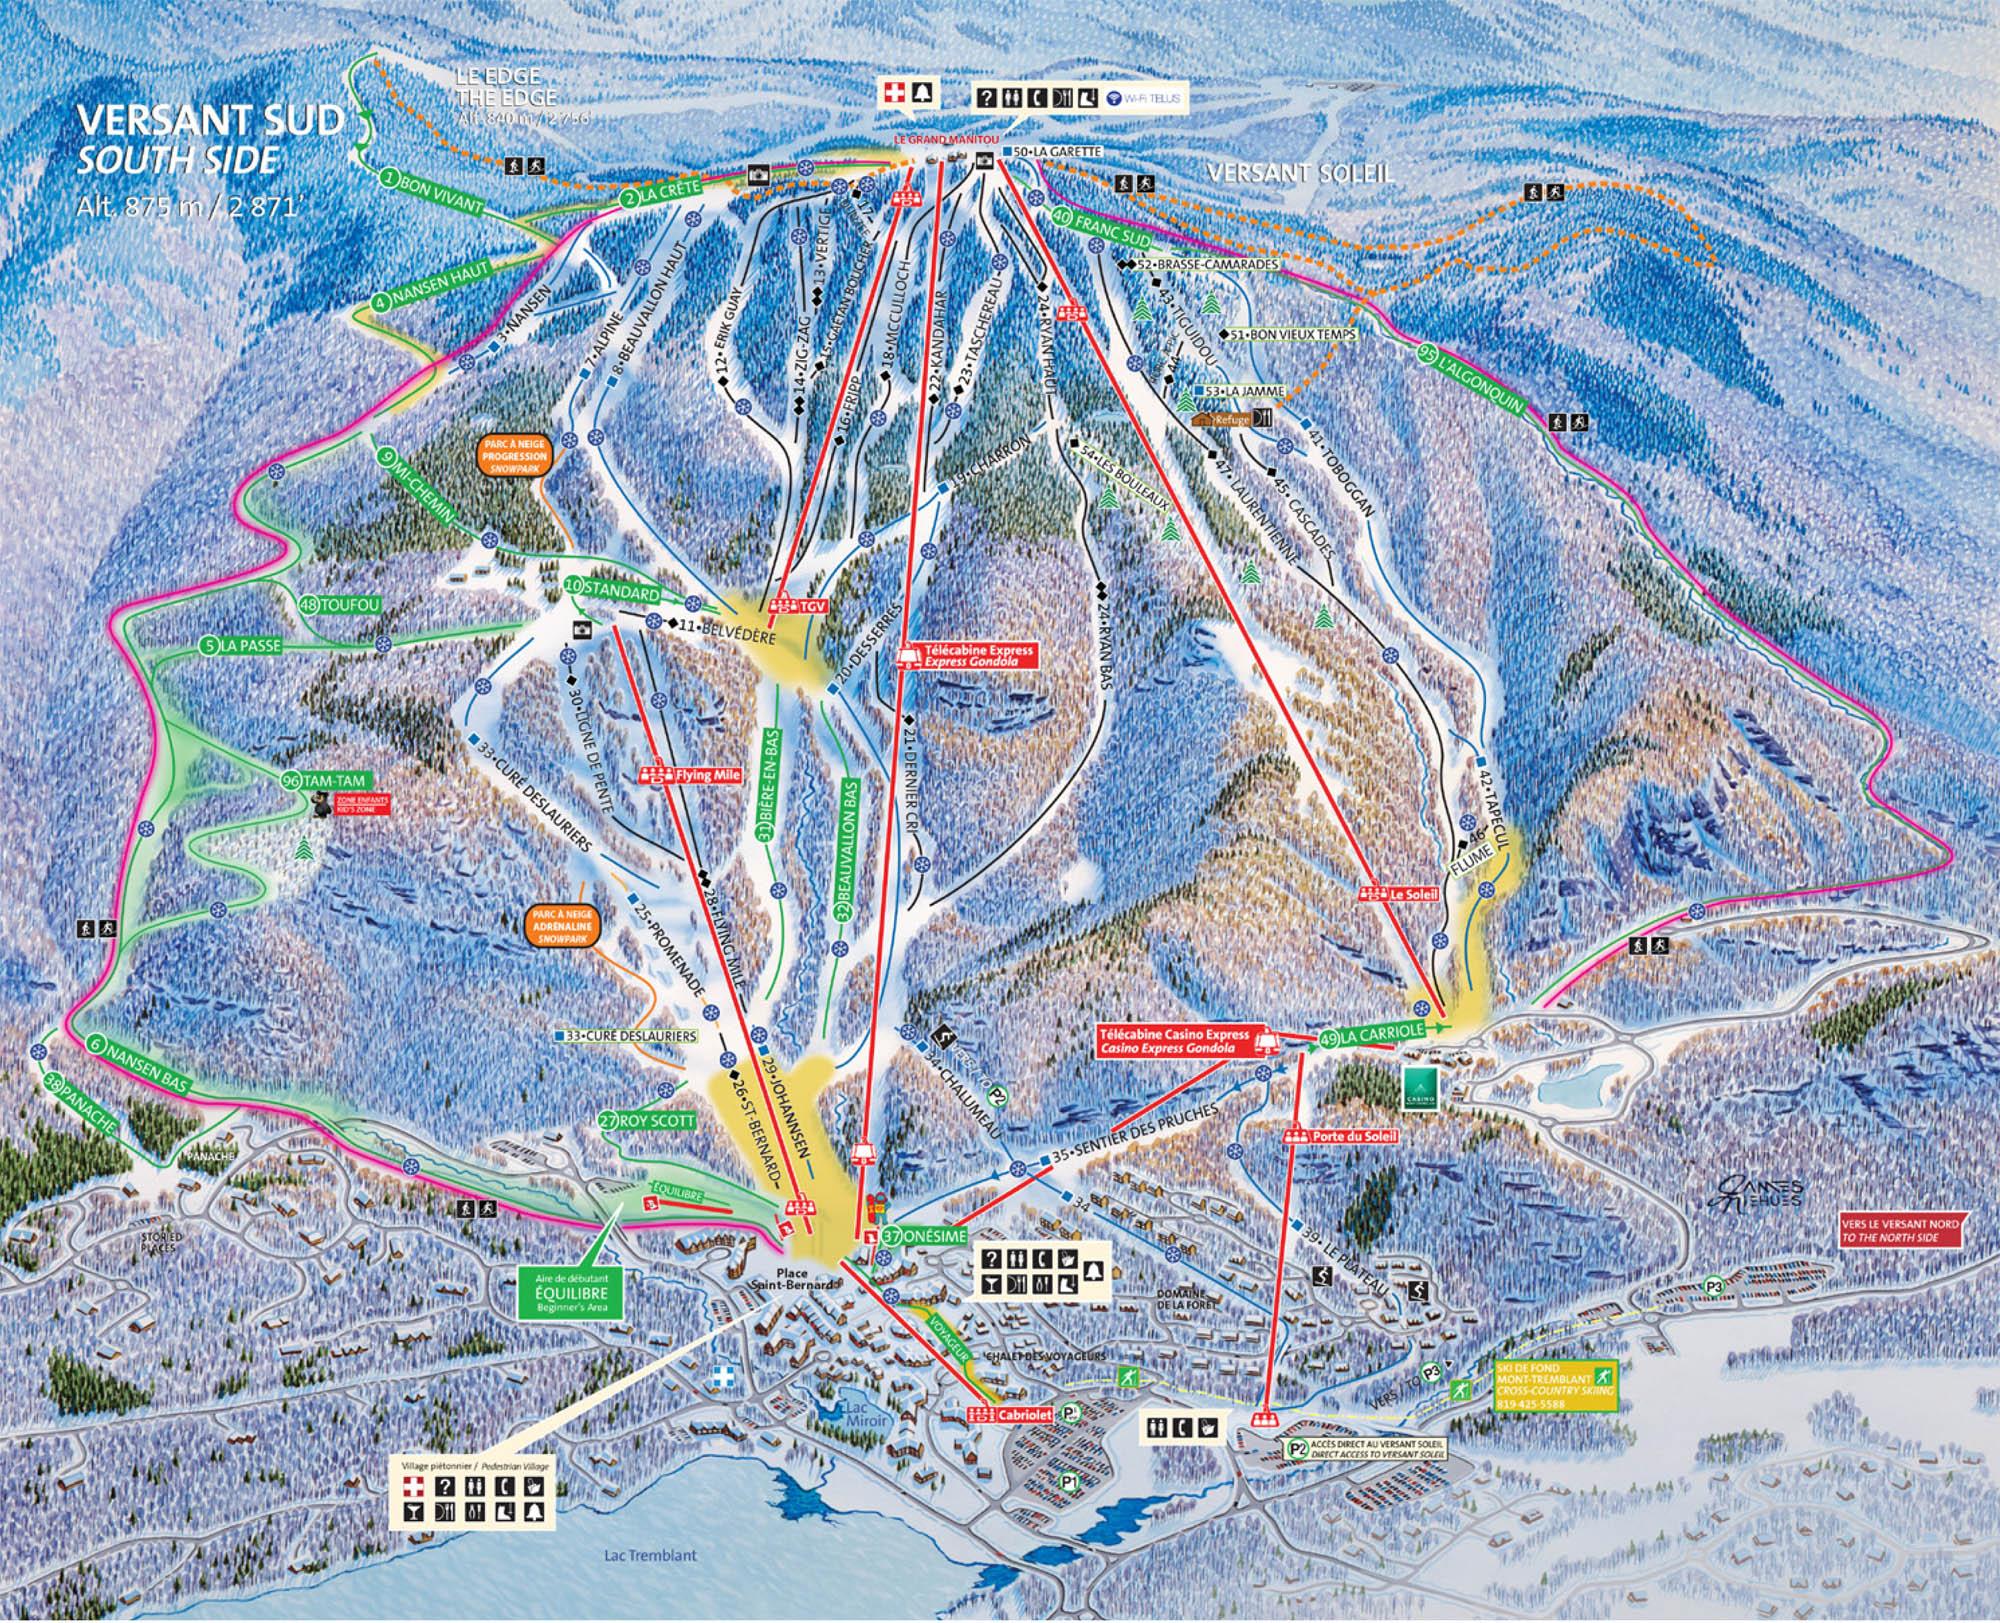 Tremblant - Ski Club of Great Britain on